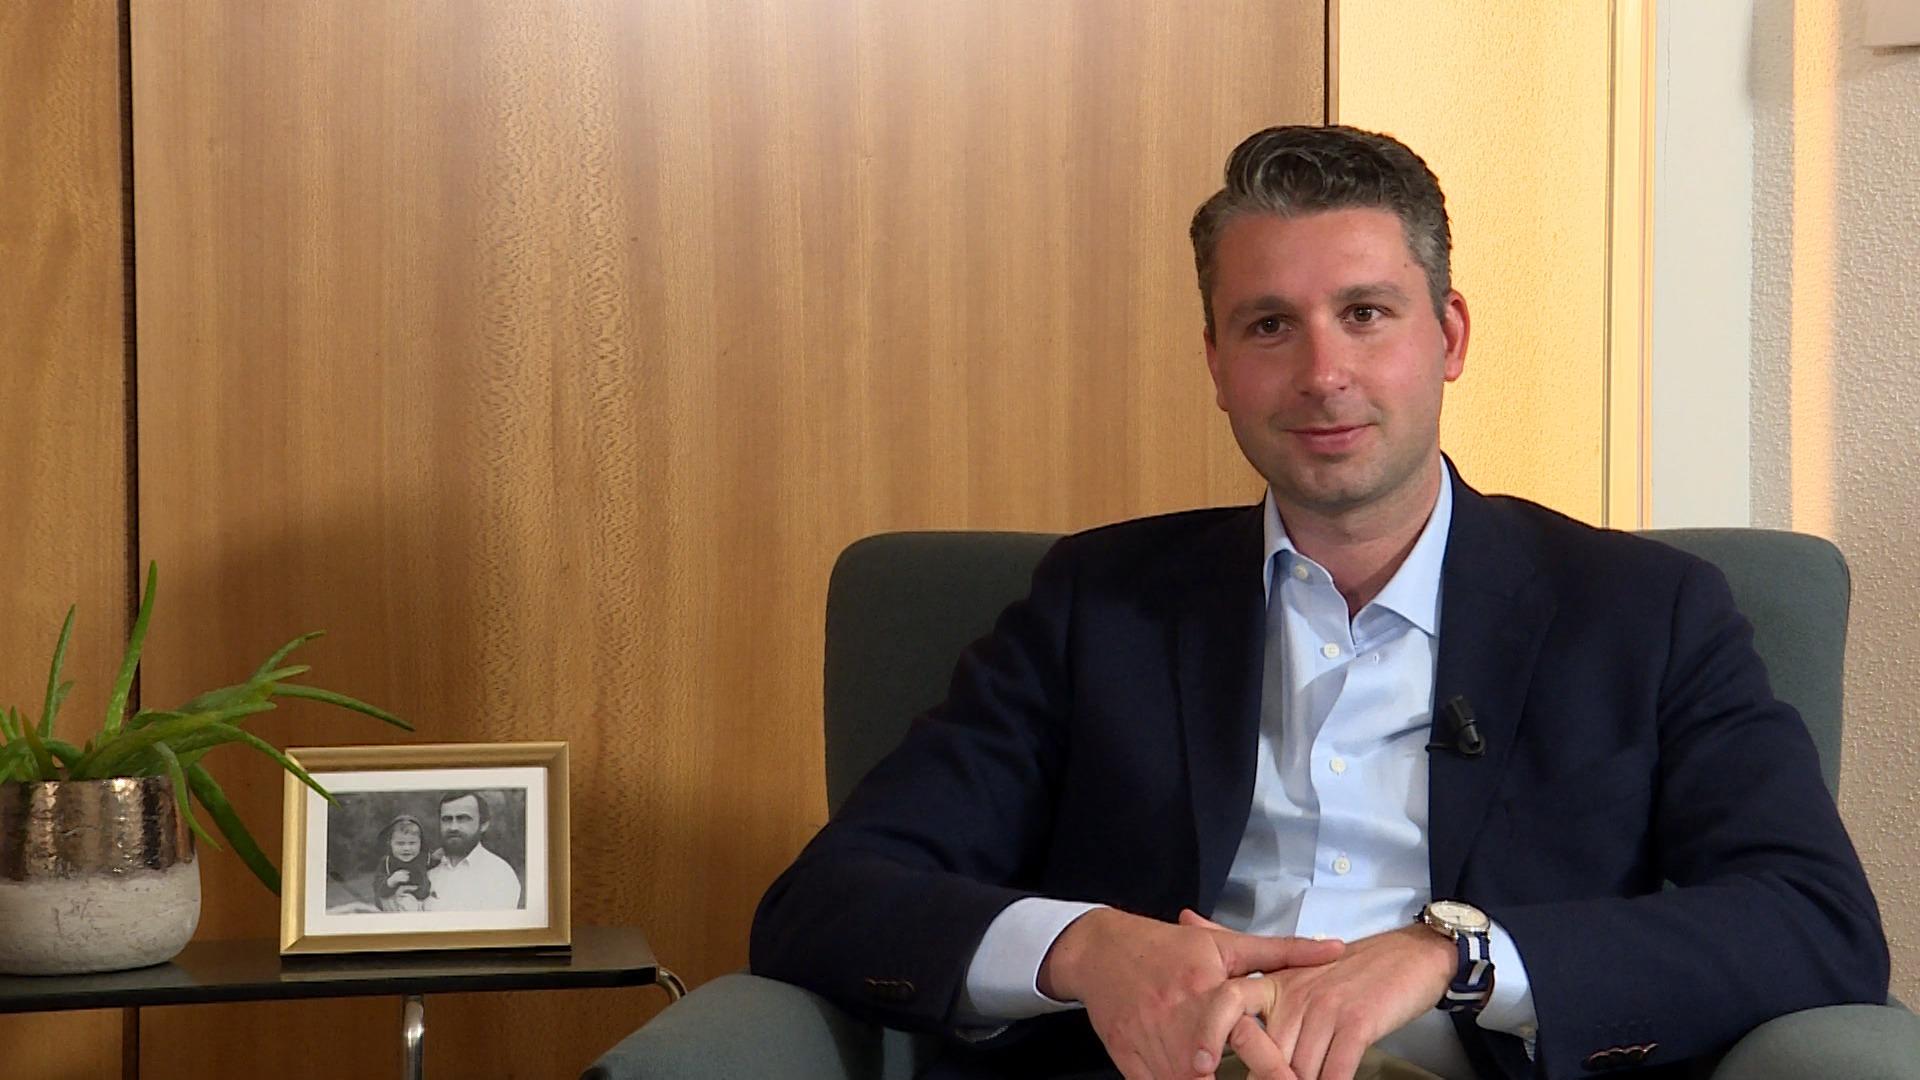 100 kandidaten: Bart Claes (Vlaams Belang)